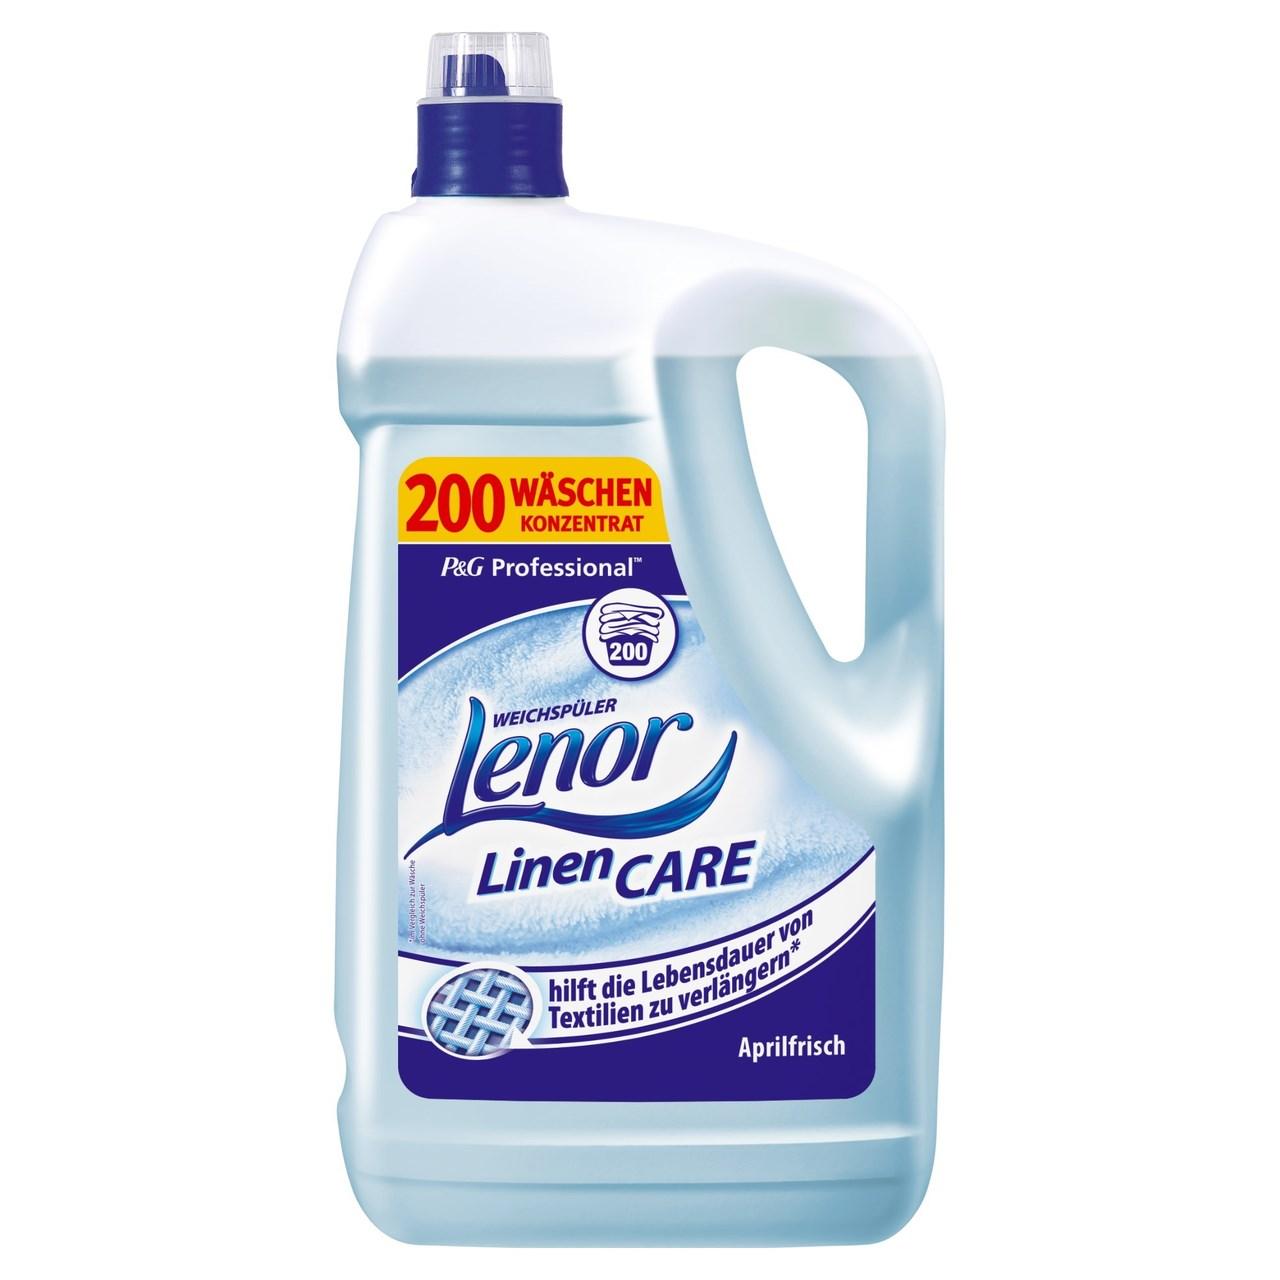 Lenor P&G Professional Spring aviváž 1x5 l